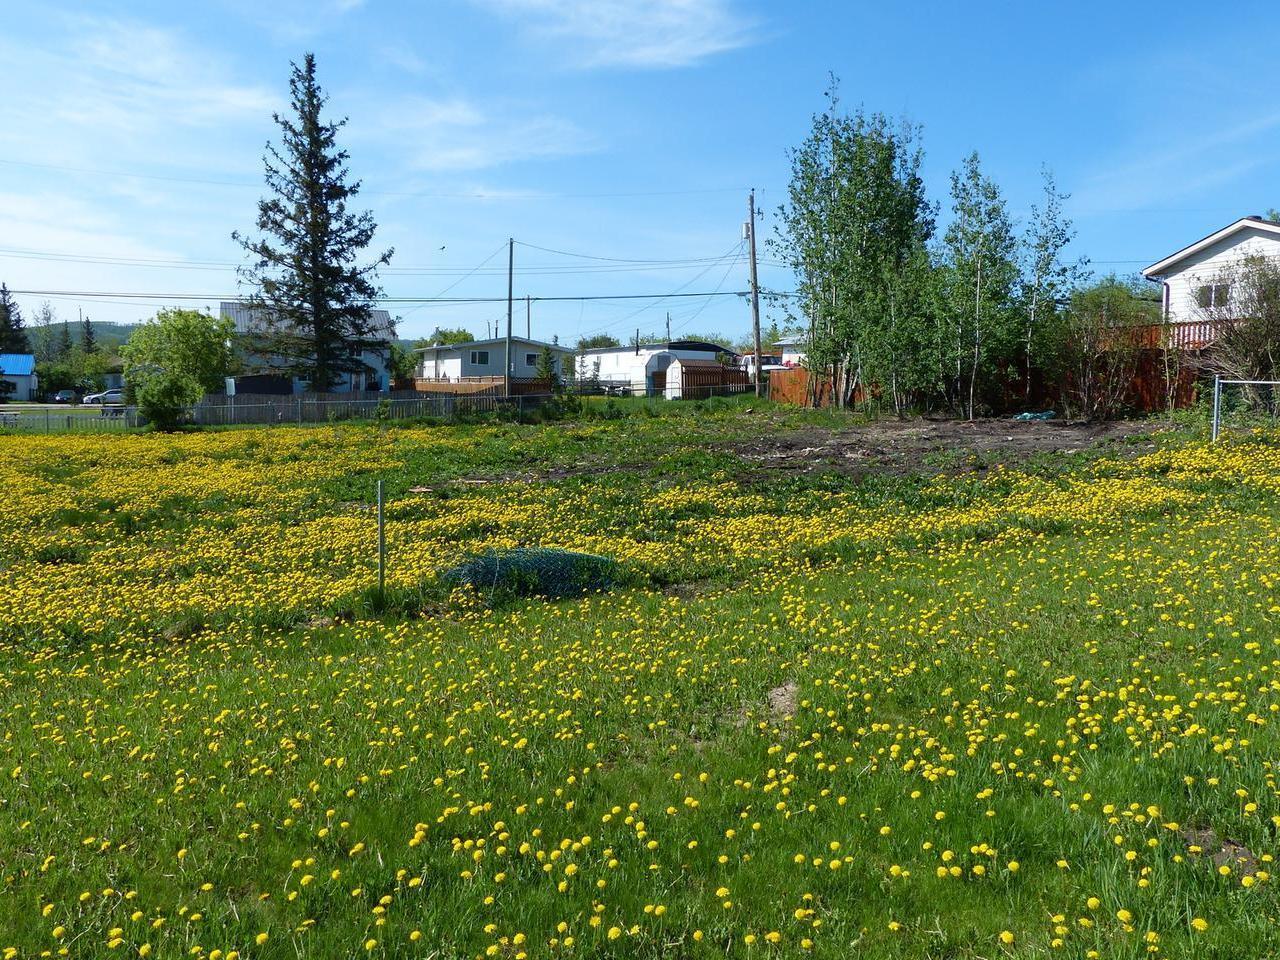 4811 49 Avenue,, Pouce Coupe, British Columbia  V0C 2C0 - Photo 2 - 169571